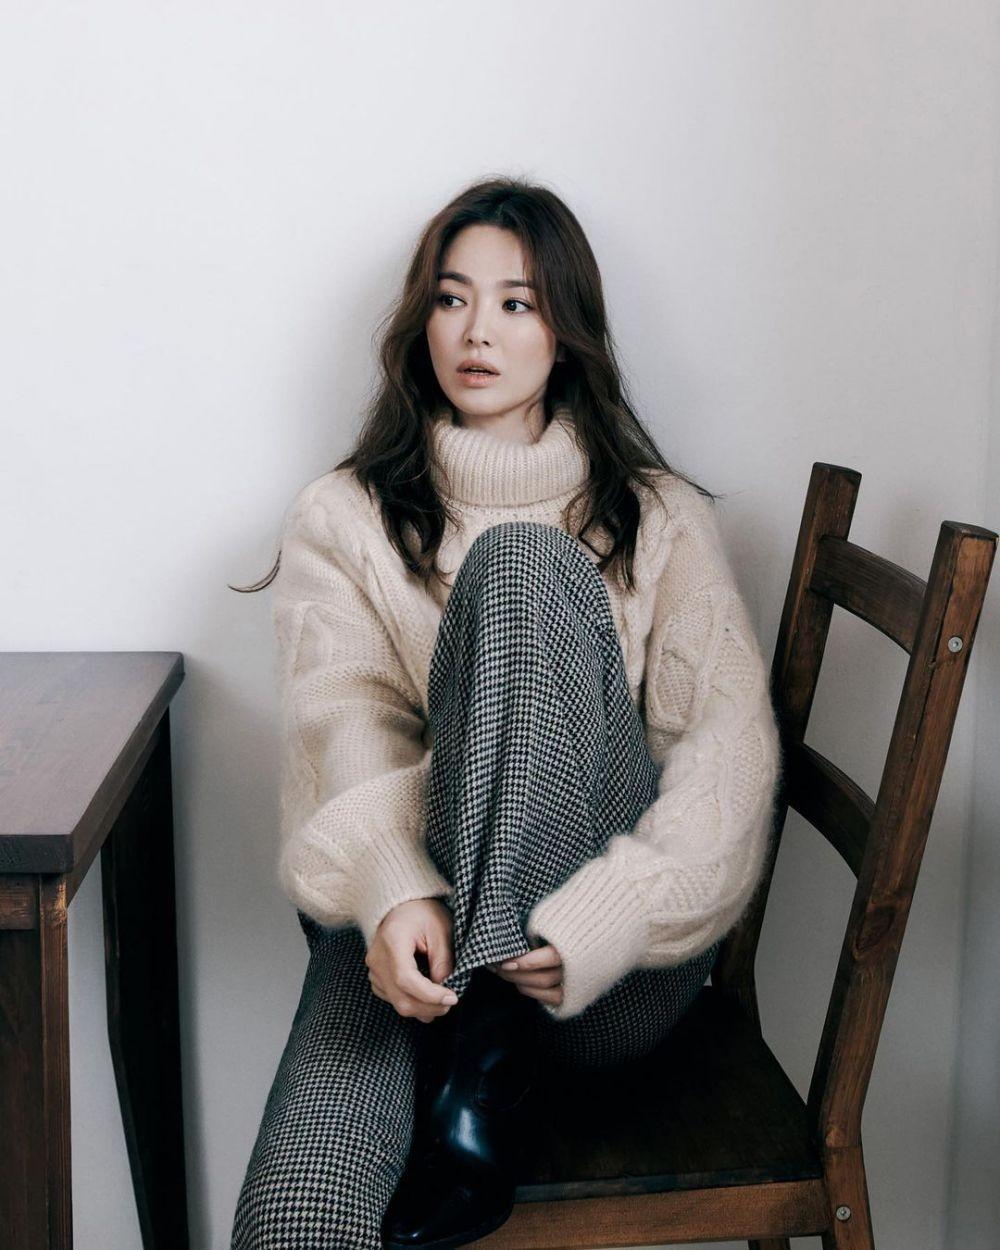 Lama Gak Muncul, Ini 10 Photoshoot Terbaru Song Hye Kyo, Manis Abis!